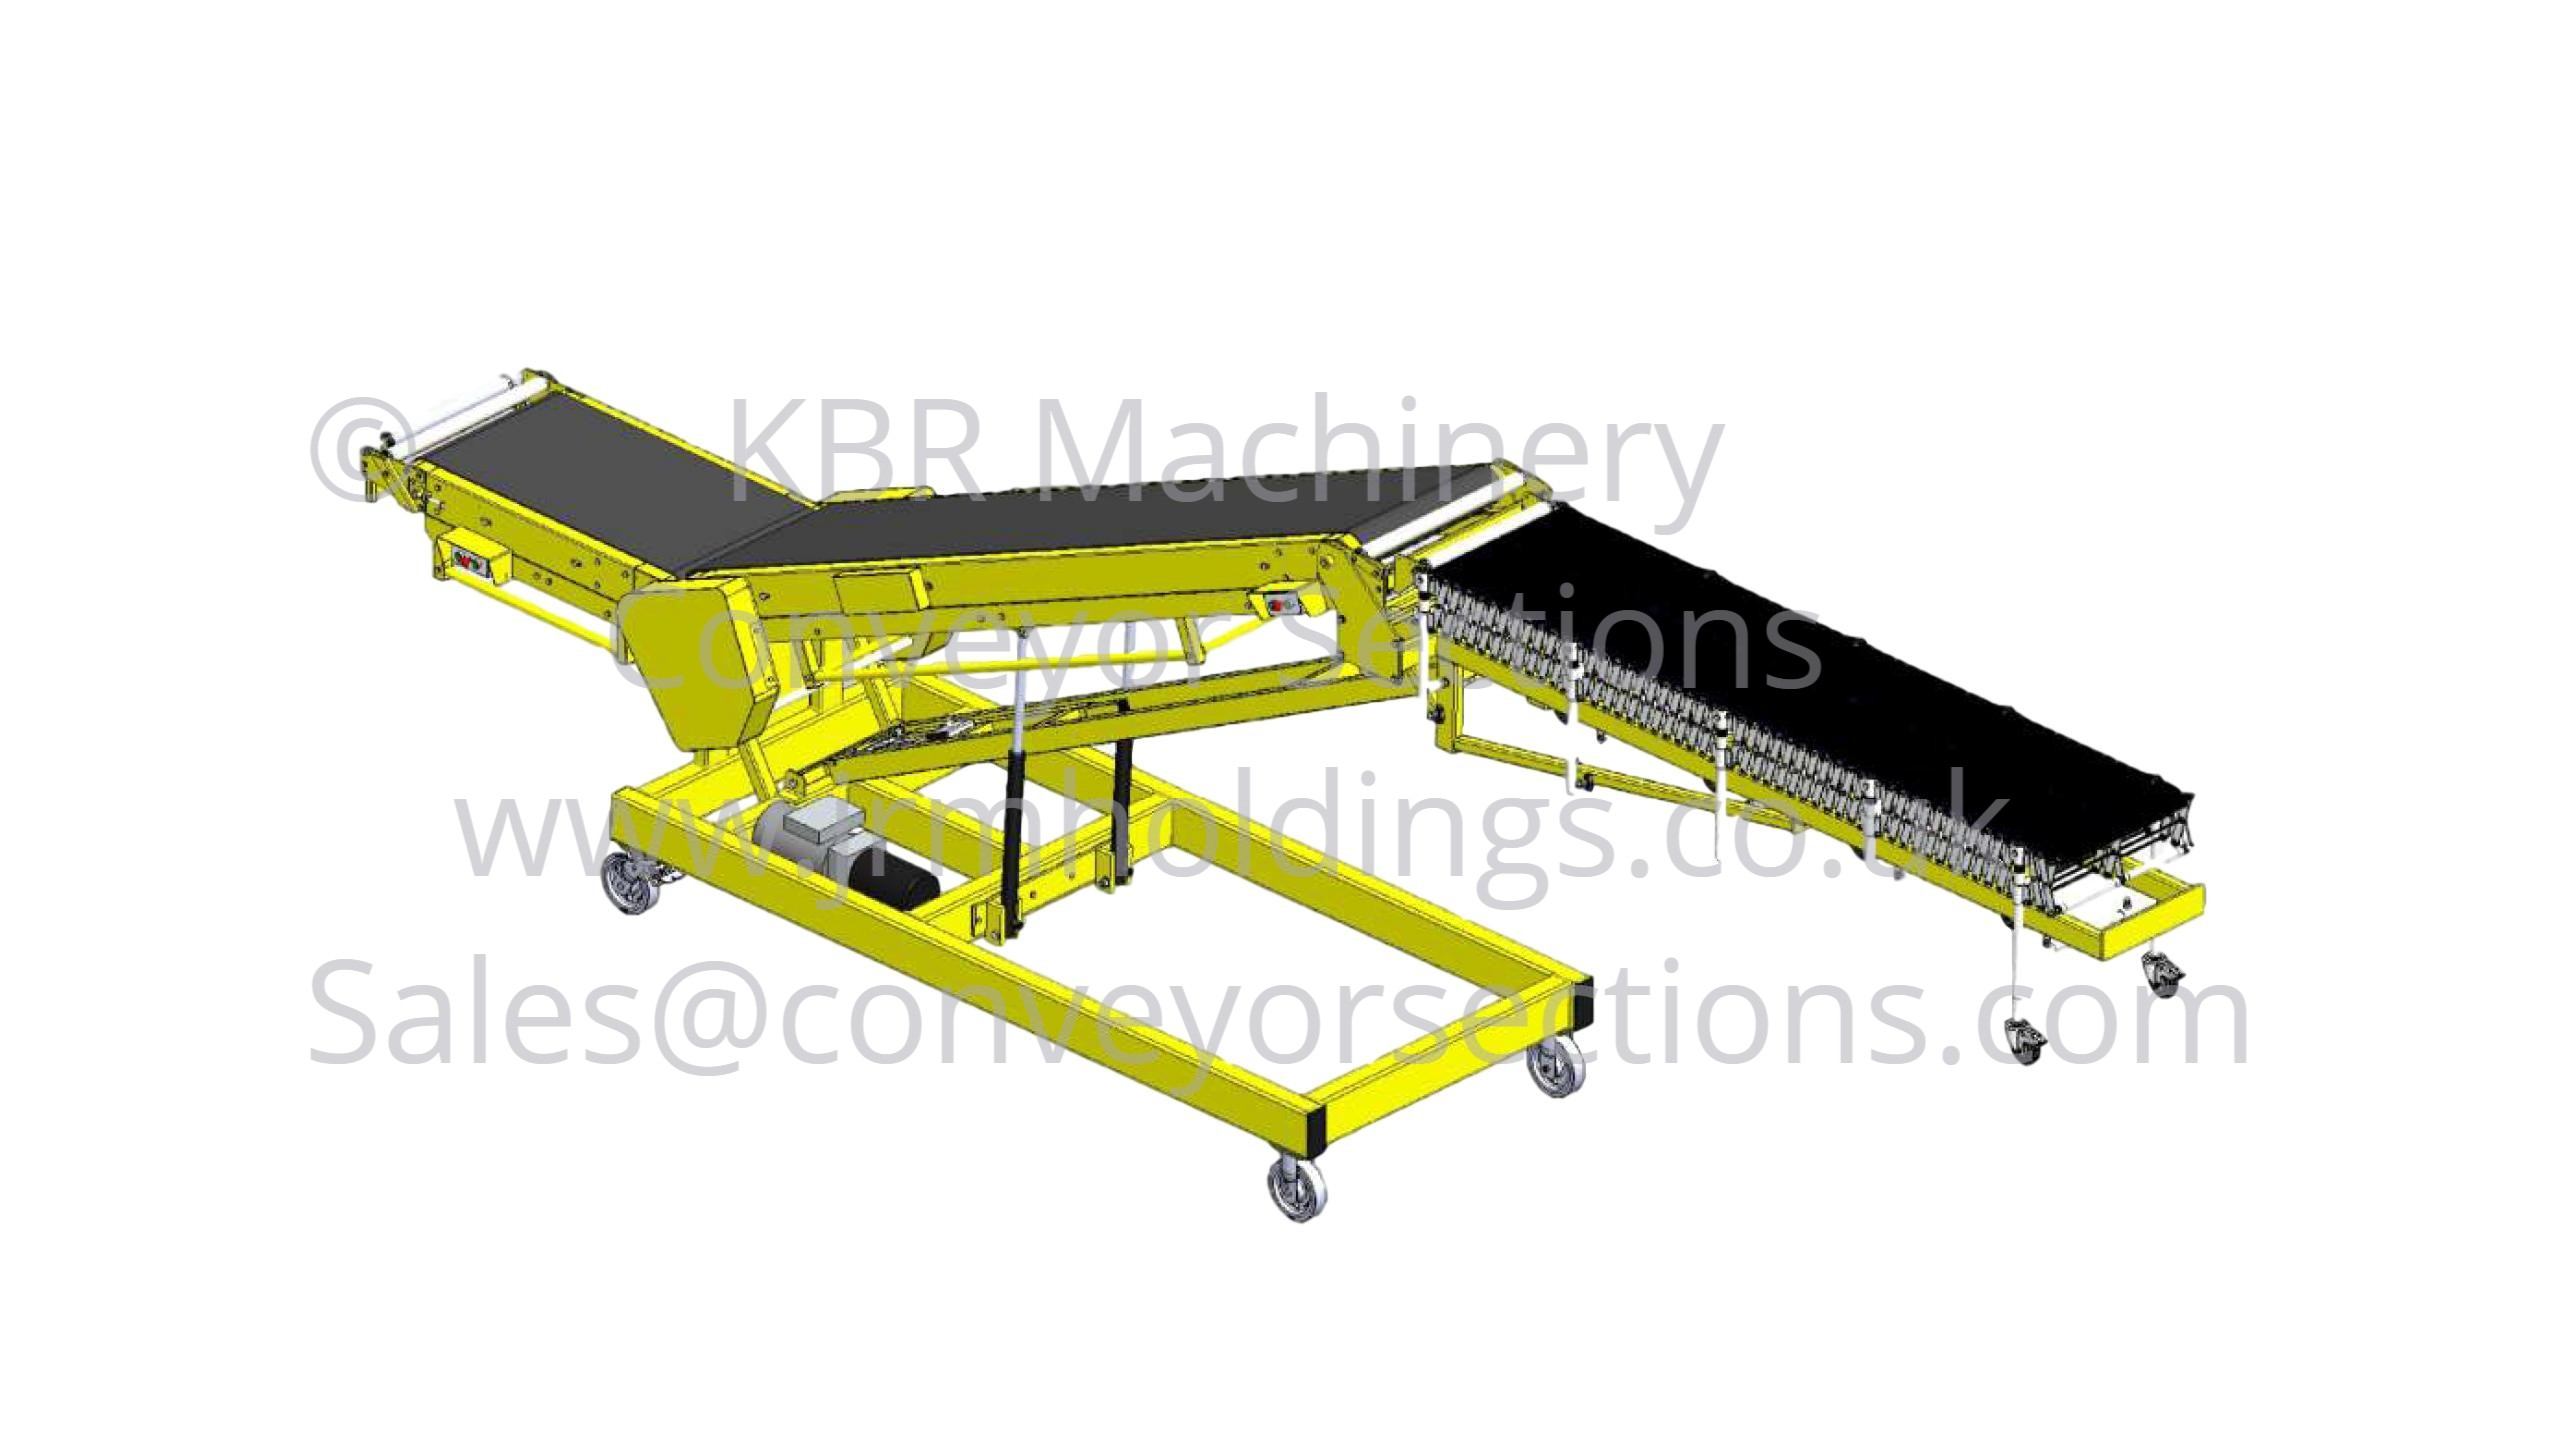 Vehicle Loading & Vehicle Unloading Conveyors - Conveyor ...   2560 x 1440 jpeg 221kB